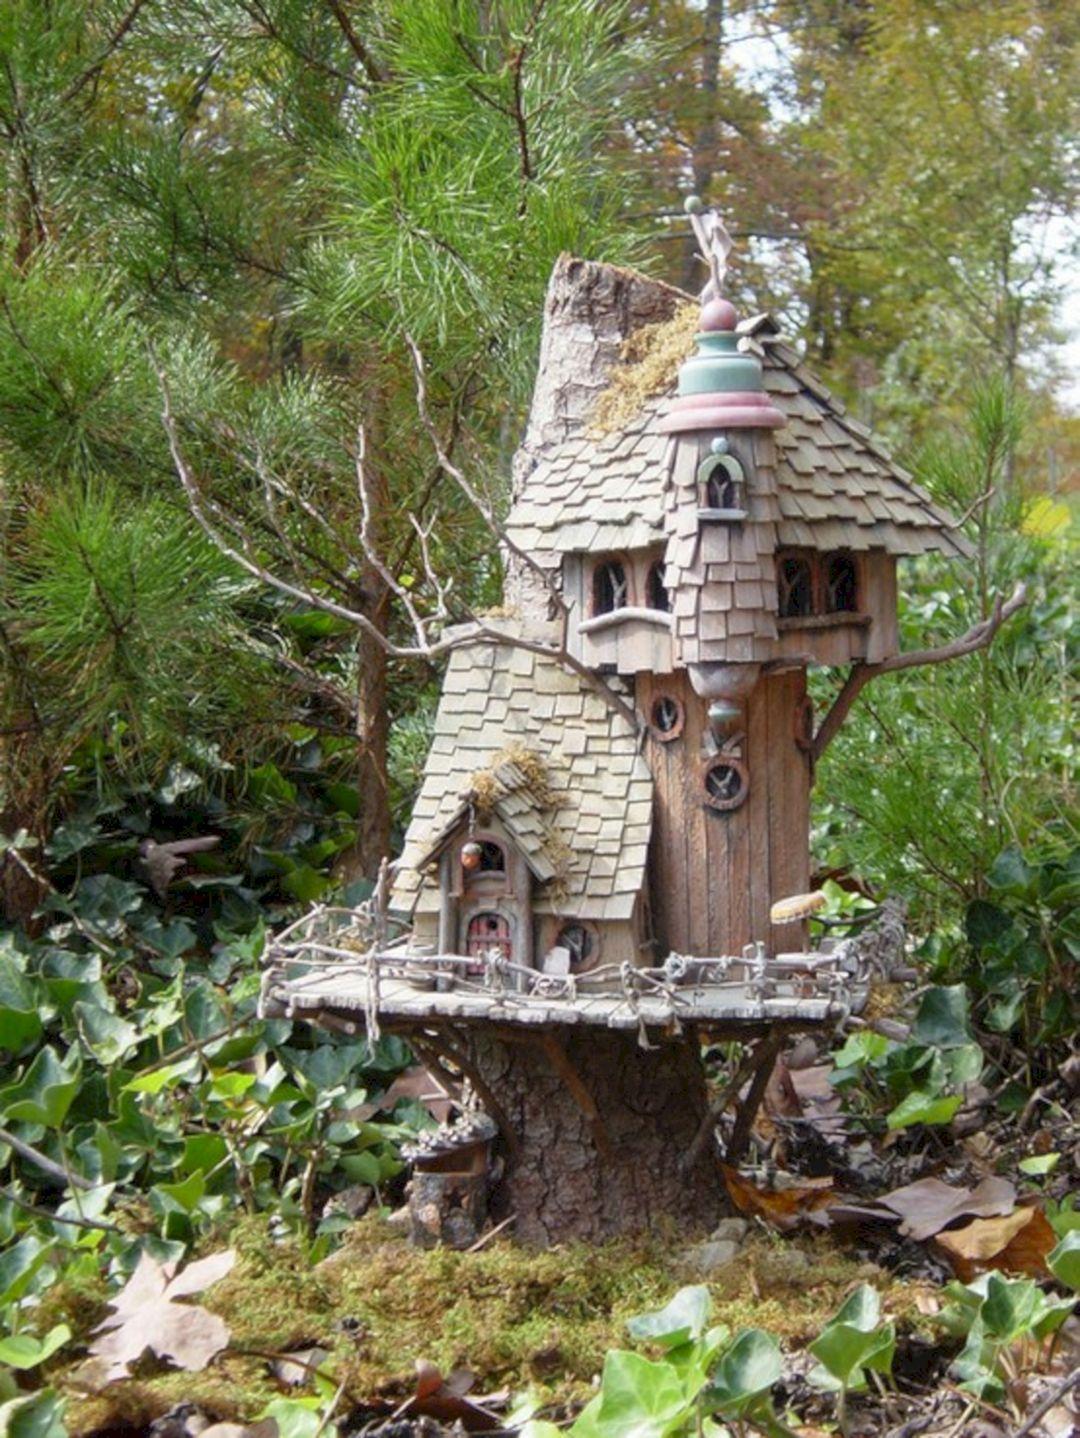 Ordinaire Excellent Tree Stump Fairy House Garden